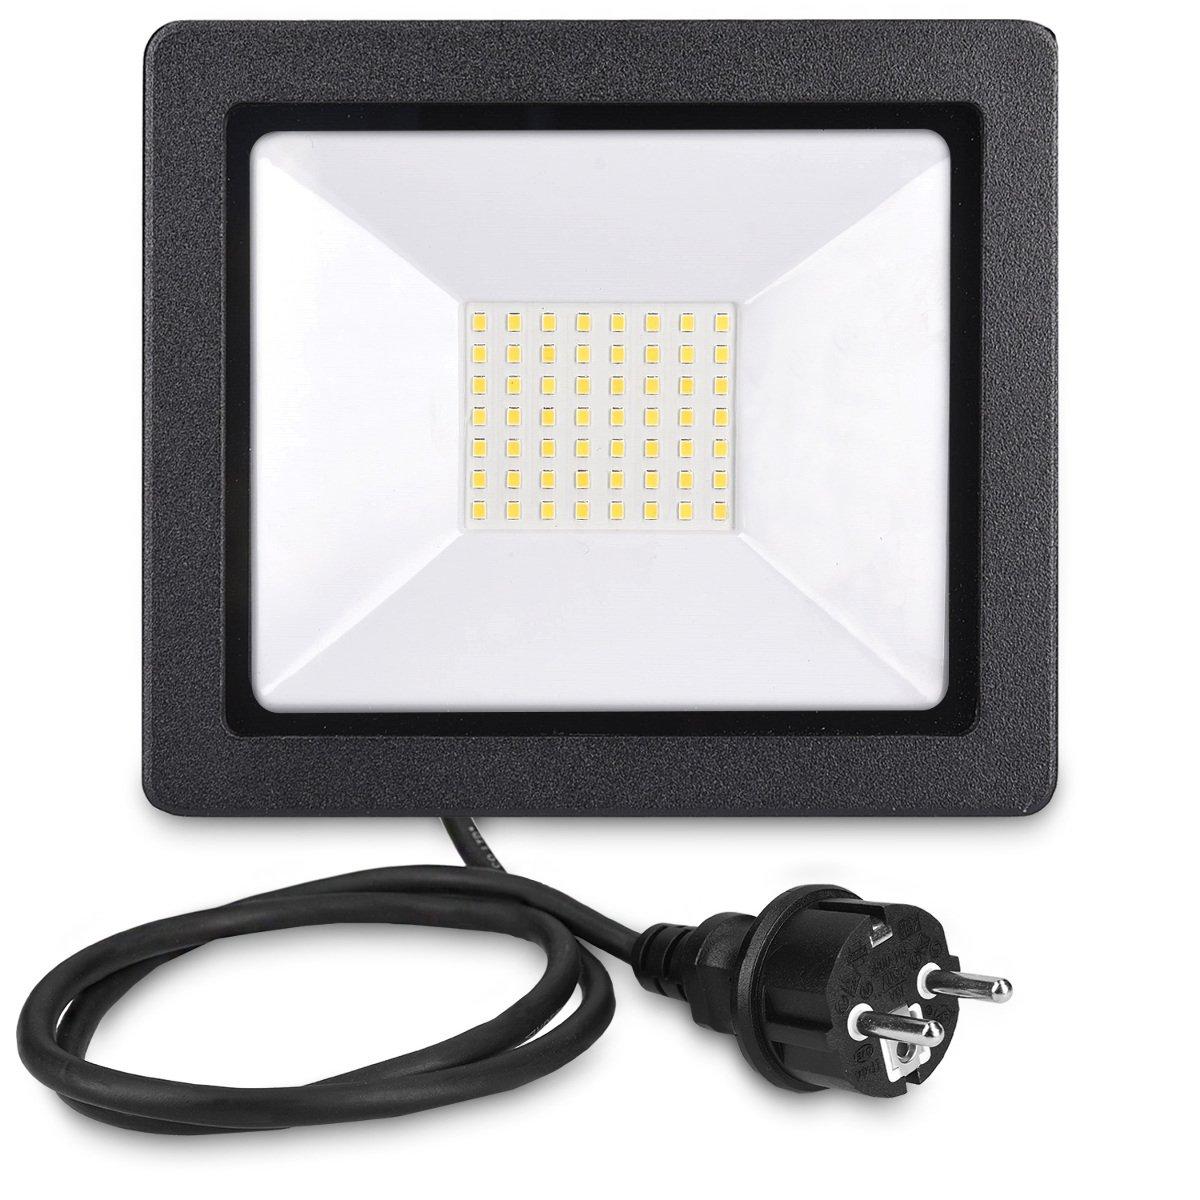 Reflector de 1600 l/úmenes para jard/ín garaje Set de 2 l/ámparas LED para interior y exterior kwmobile 2x Foco proyector LED de exteriores de 20W